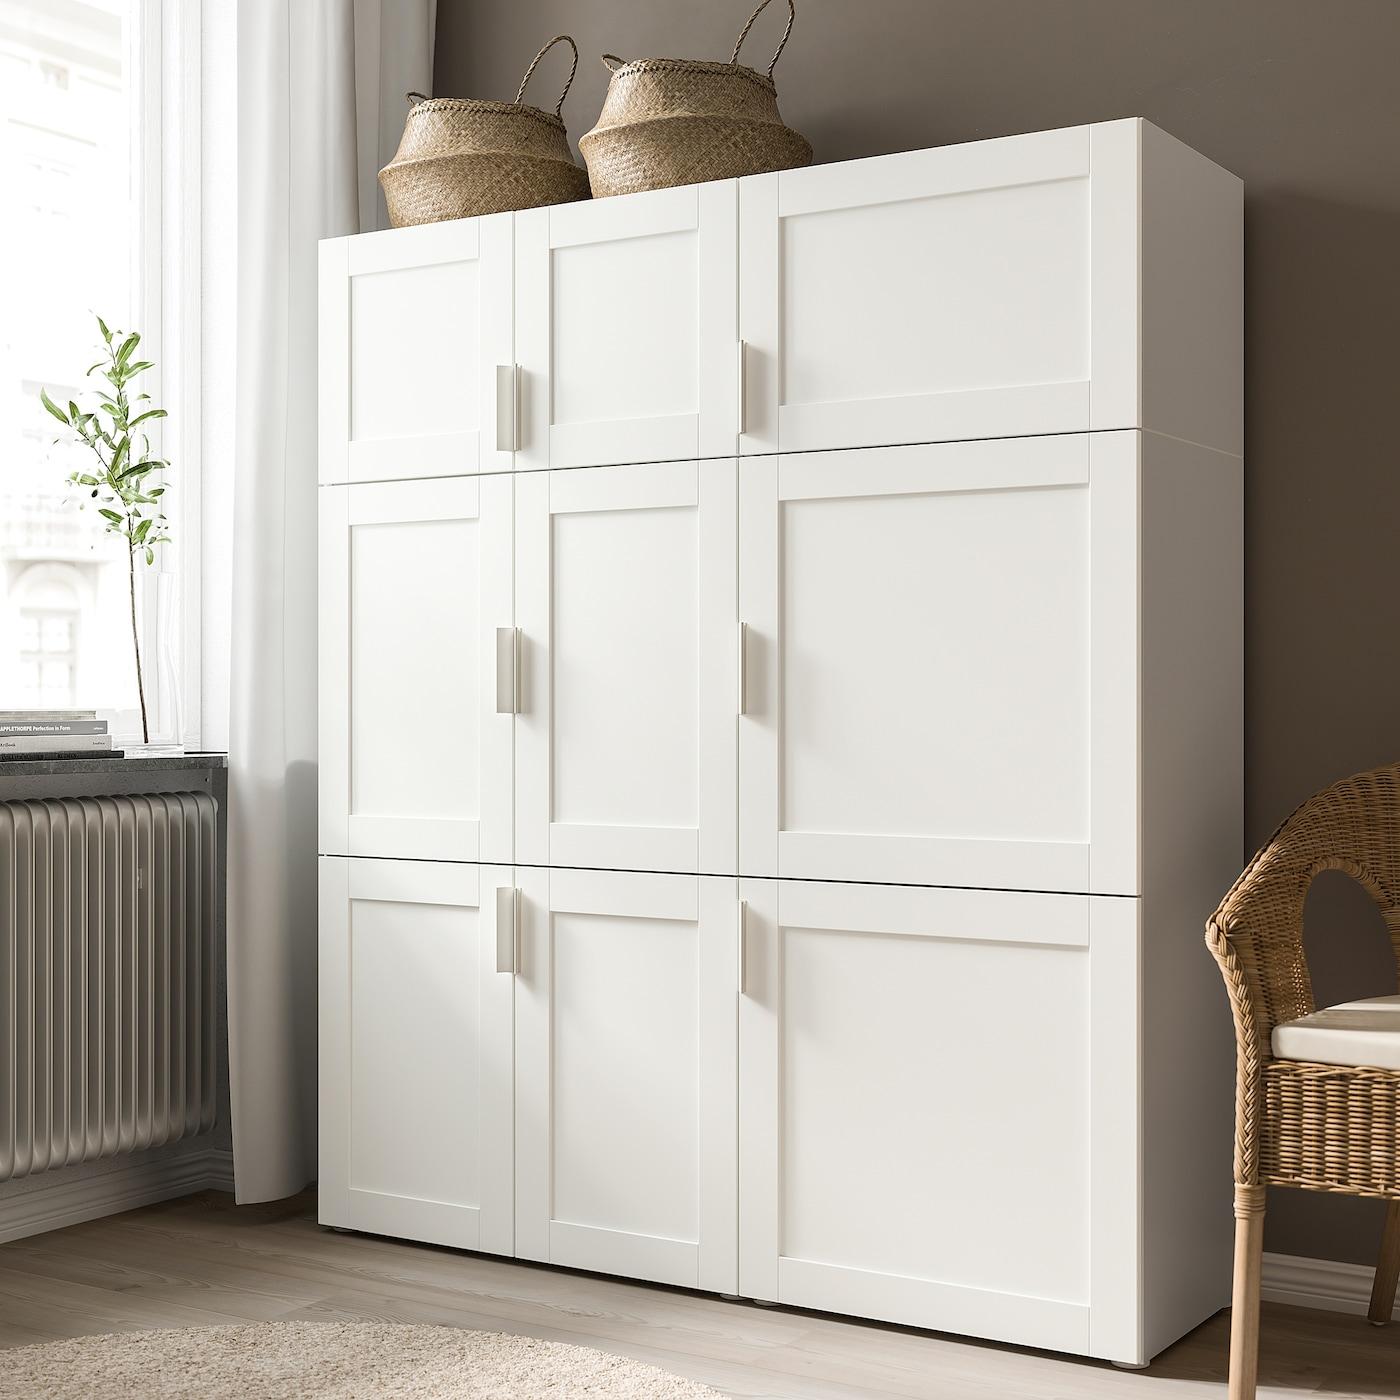 SANNIDAL Tür   weiß 20x20 cm